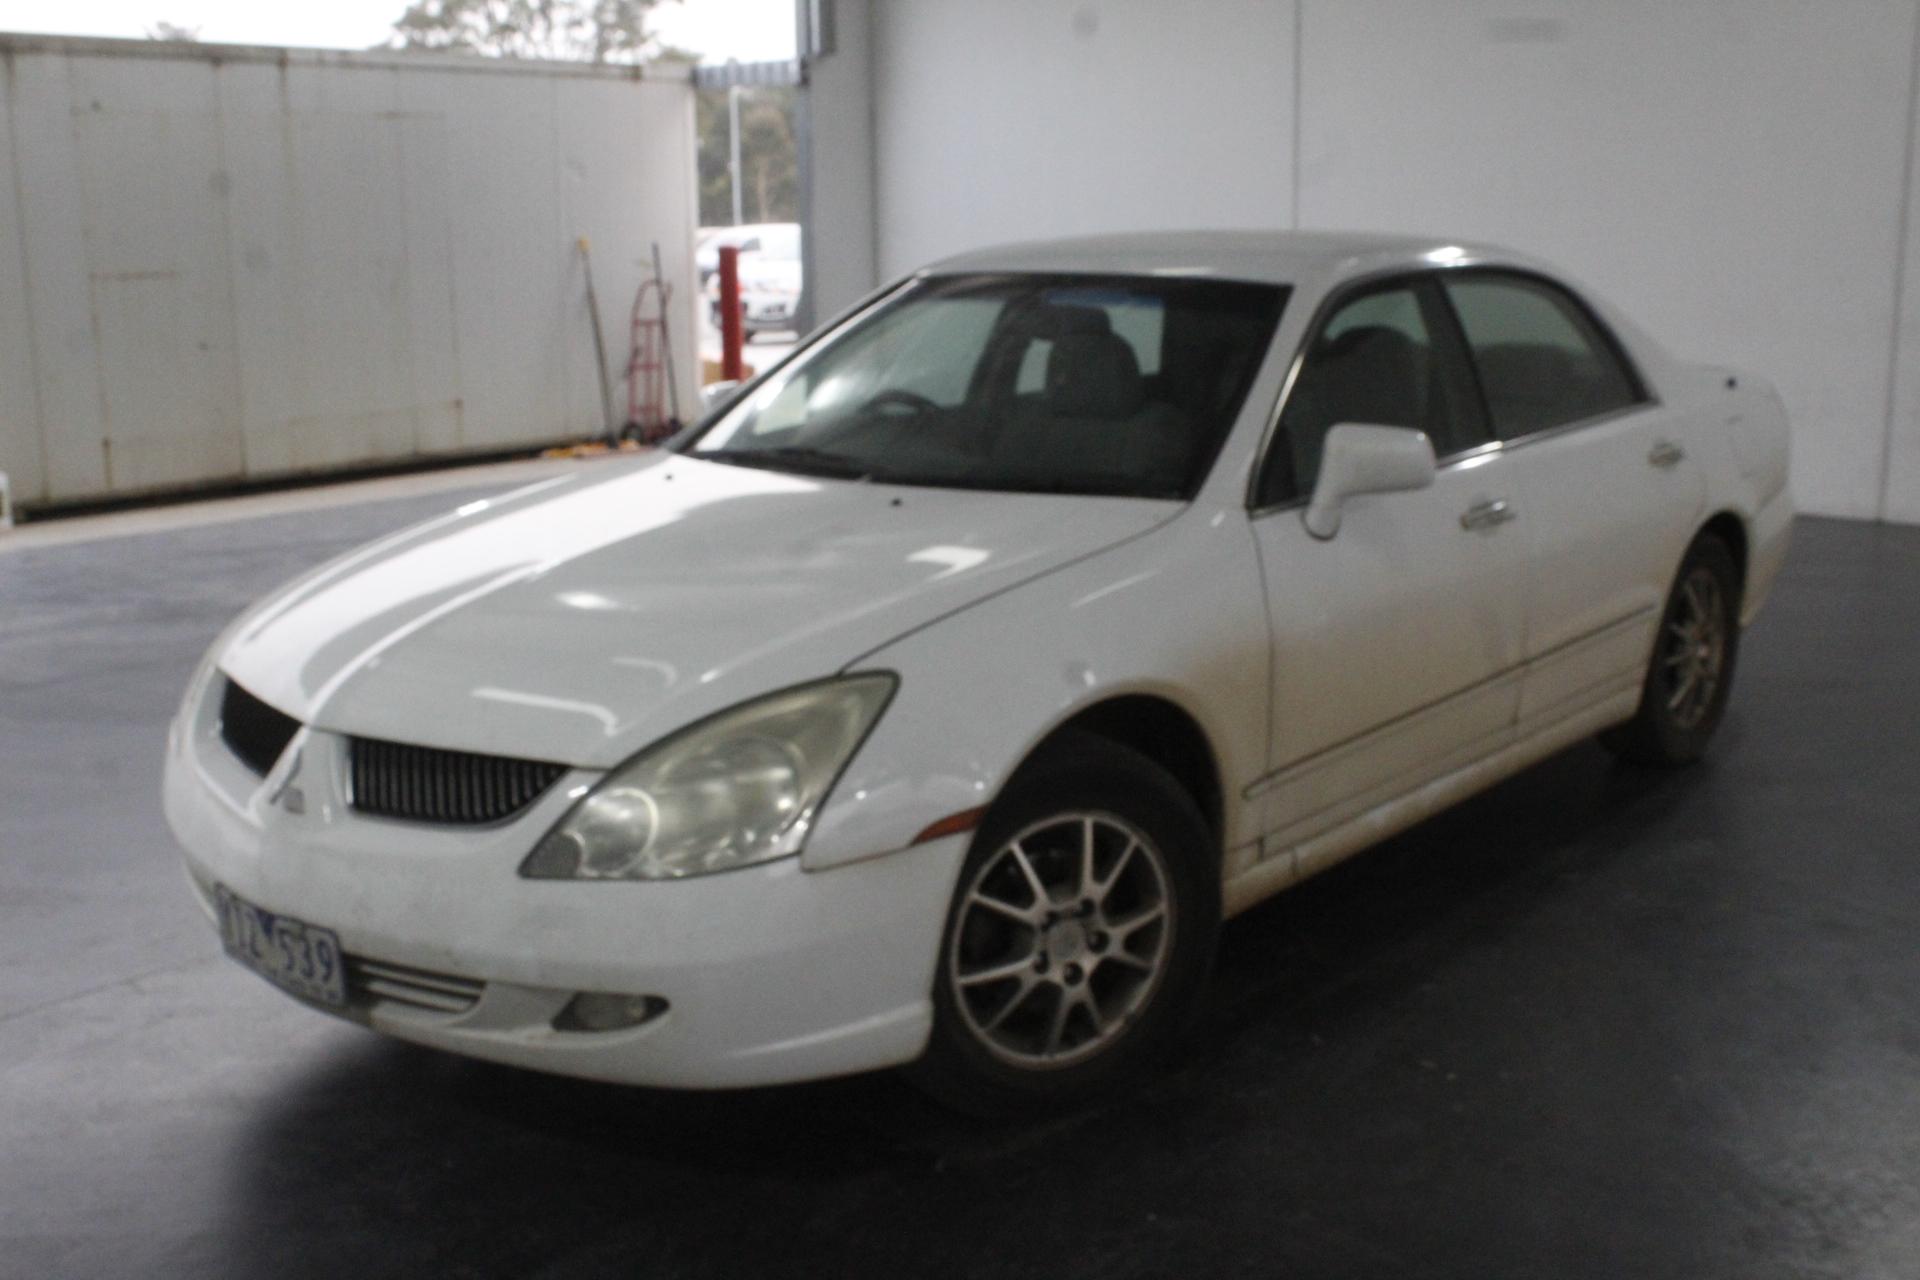 2003 Mitsubishi Verada Ei KL Automatic Sedan